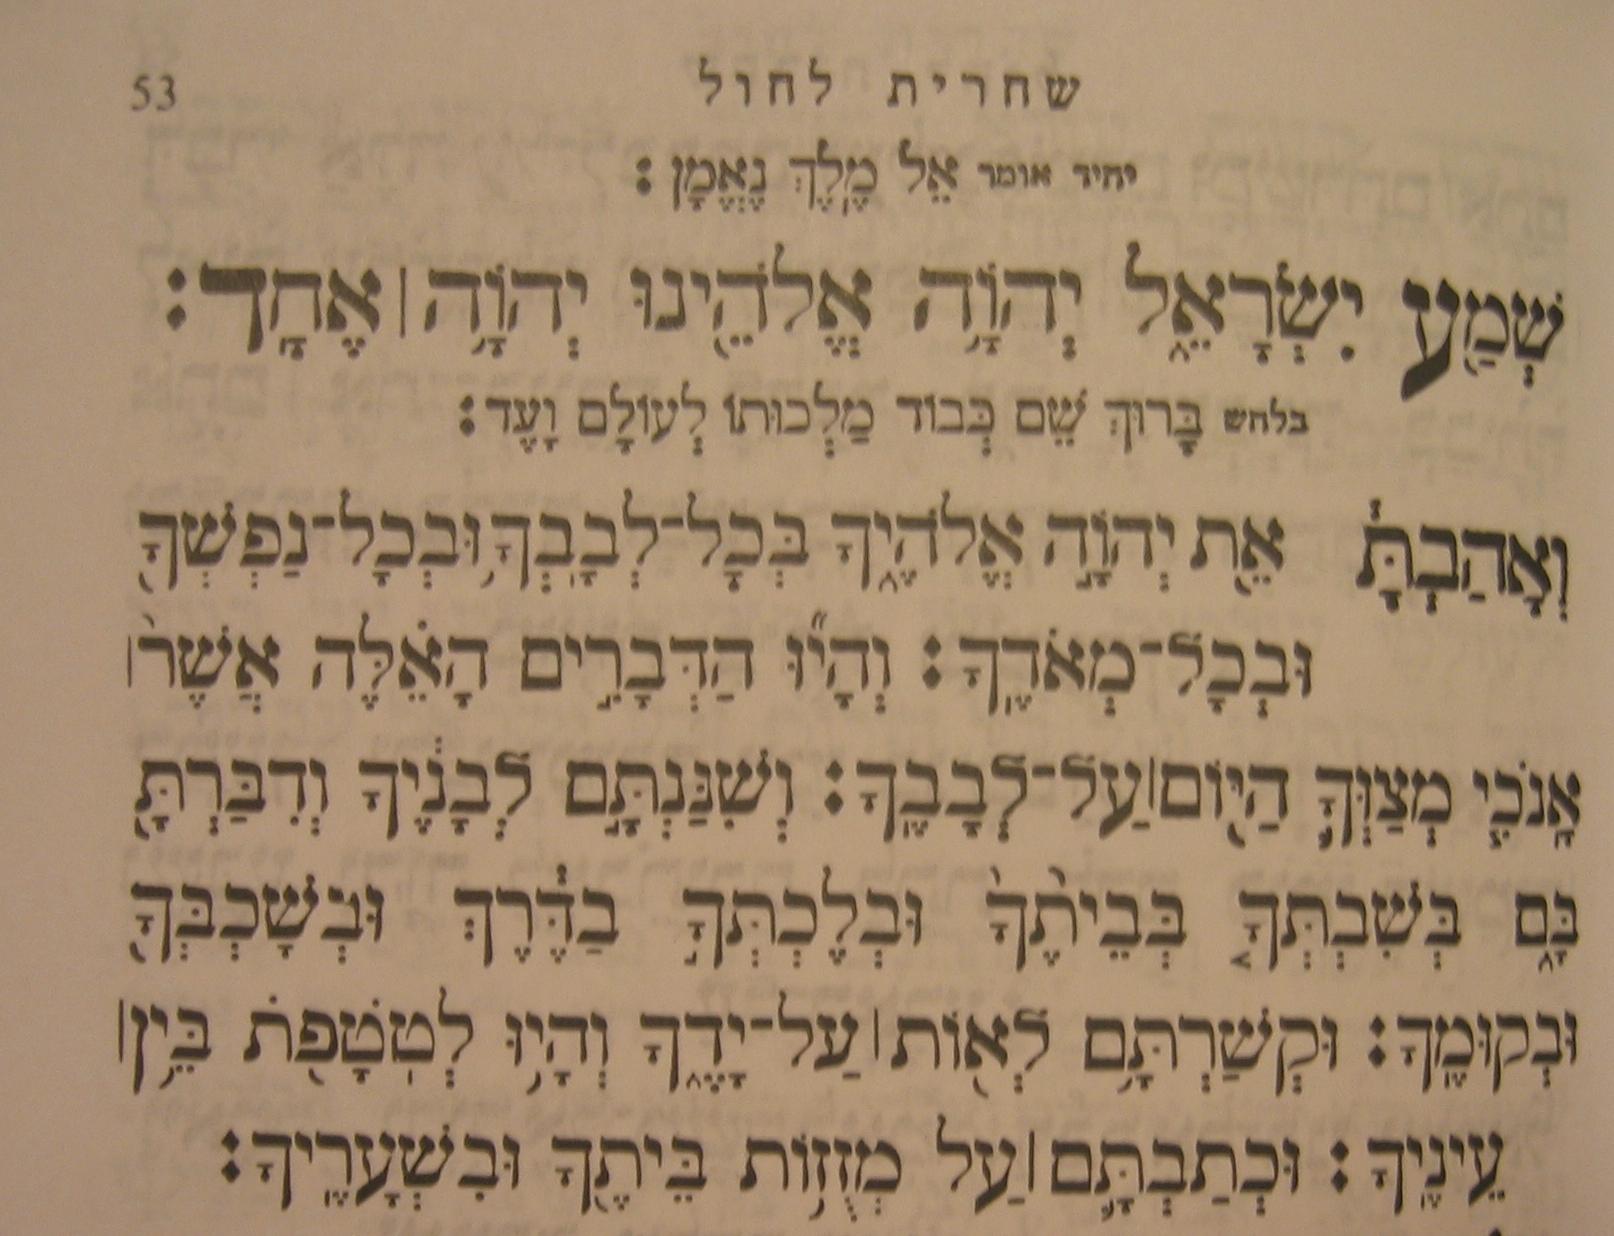 The shema israel-6533